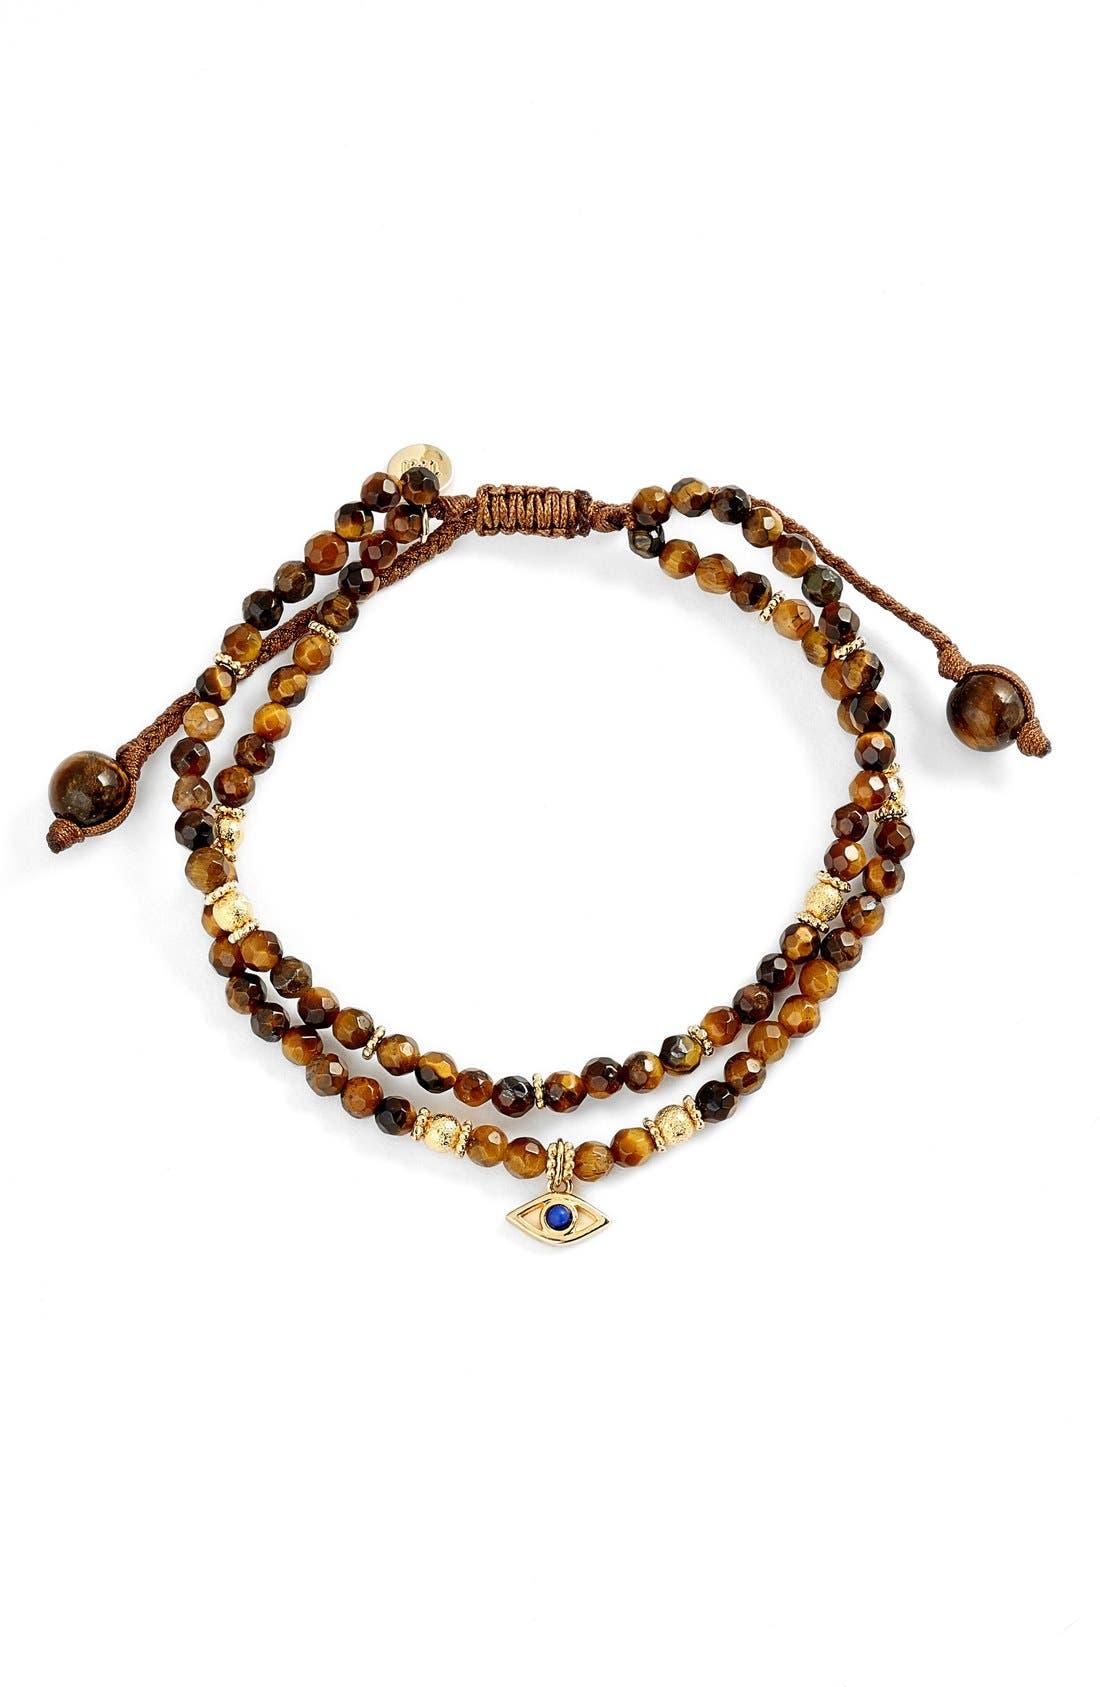 Alternate Image 1 Selected - Tai Beaded Multistrand Friendship Bracelet